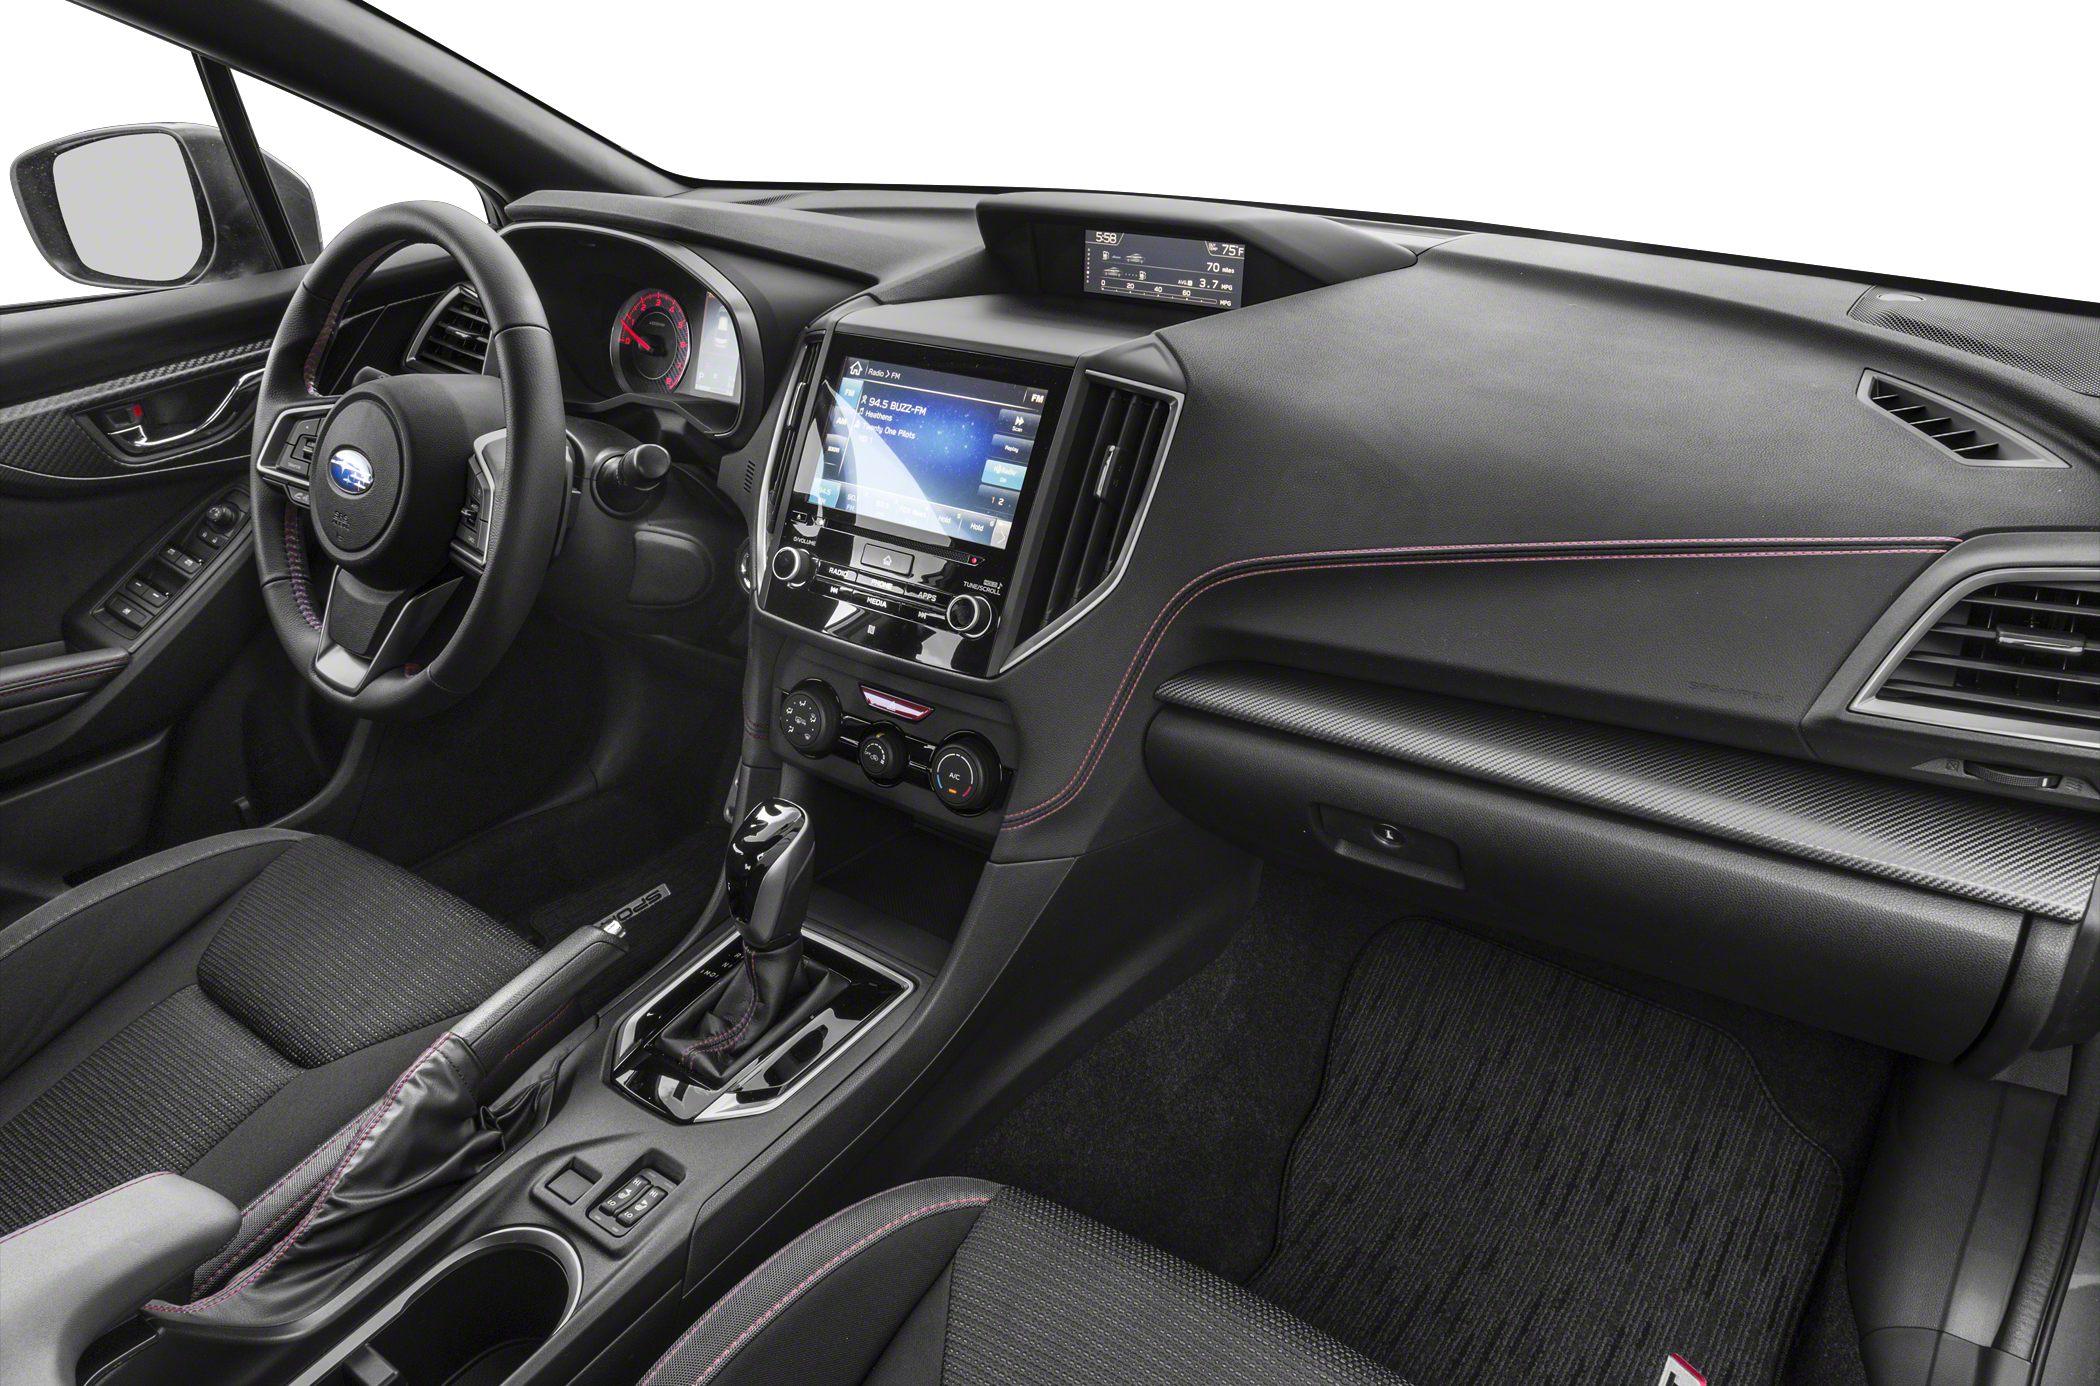 2018 Subaru Impreza Specs Safety Rating & MPG CarsDirect